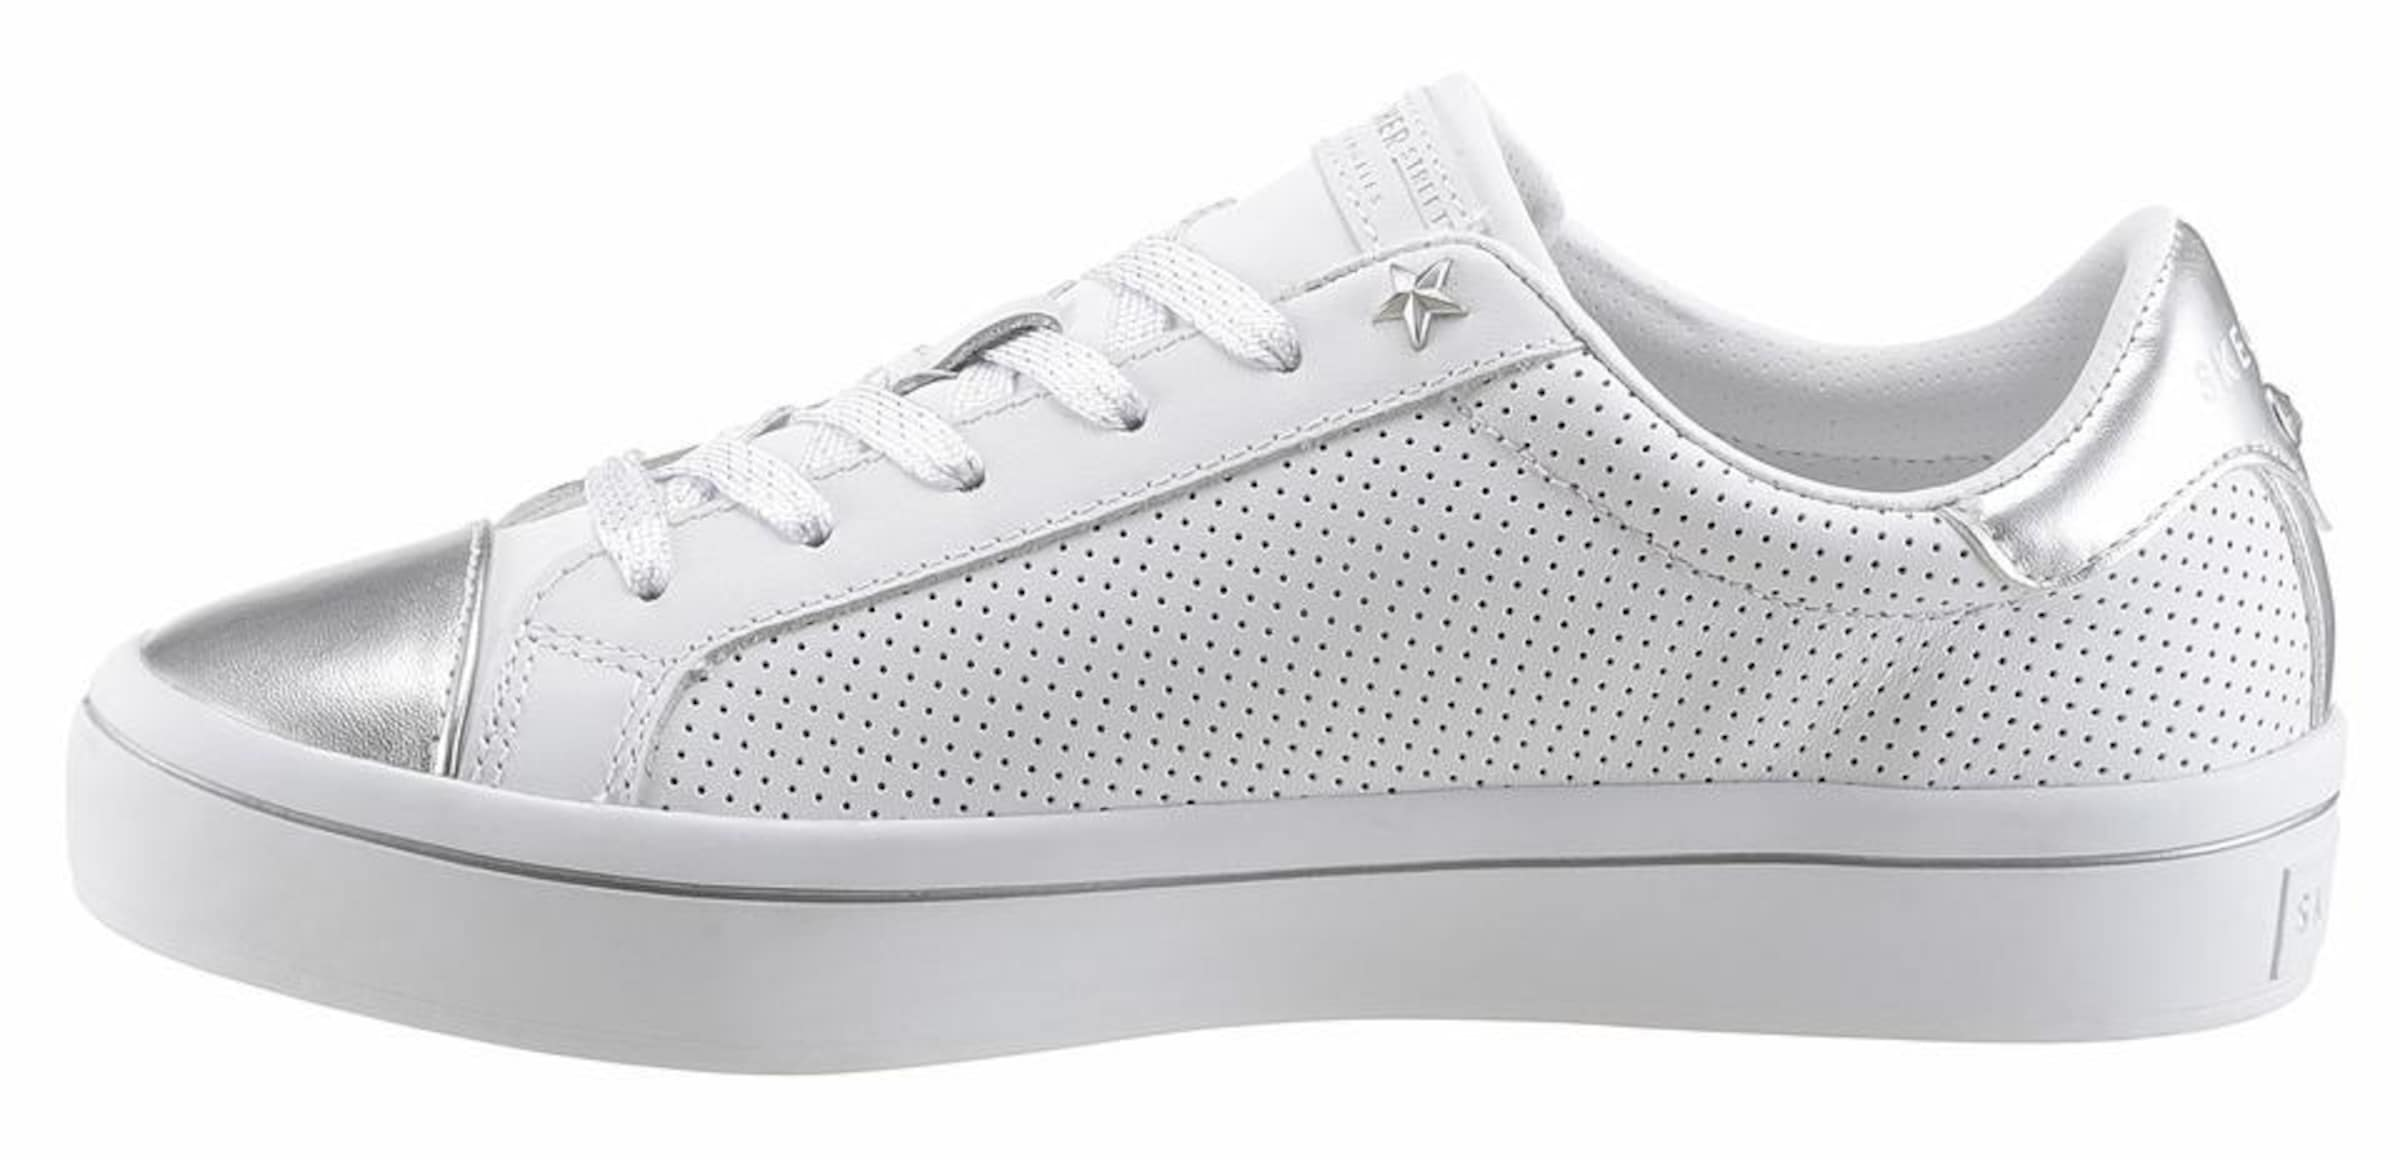 Skechers In Silber 'hi Sneaker magnetoes' lite VqSUMGzp